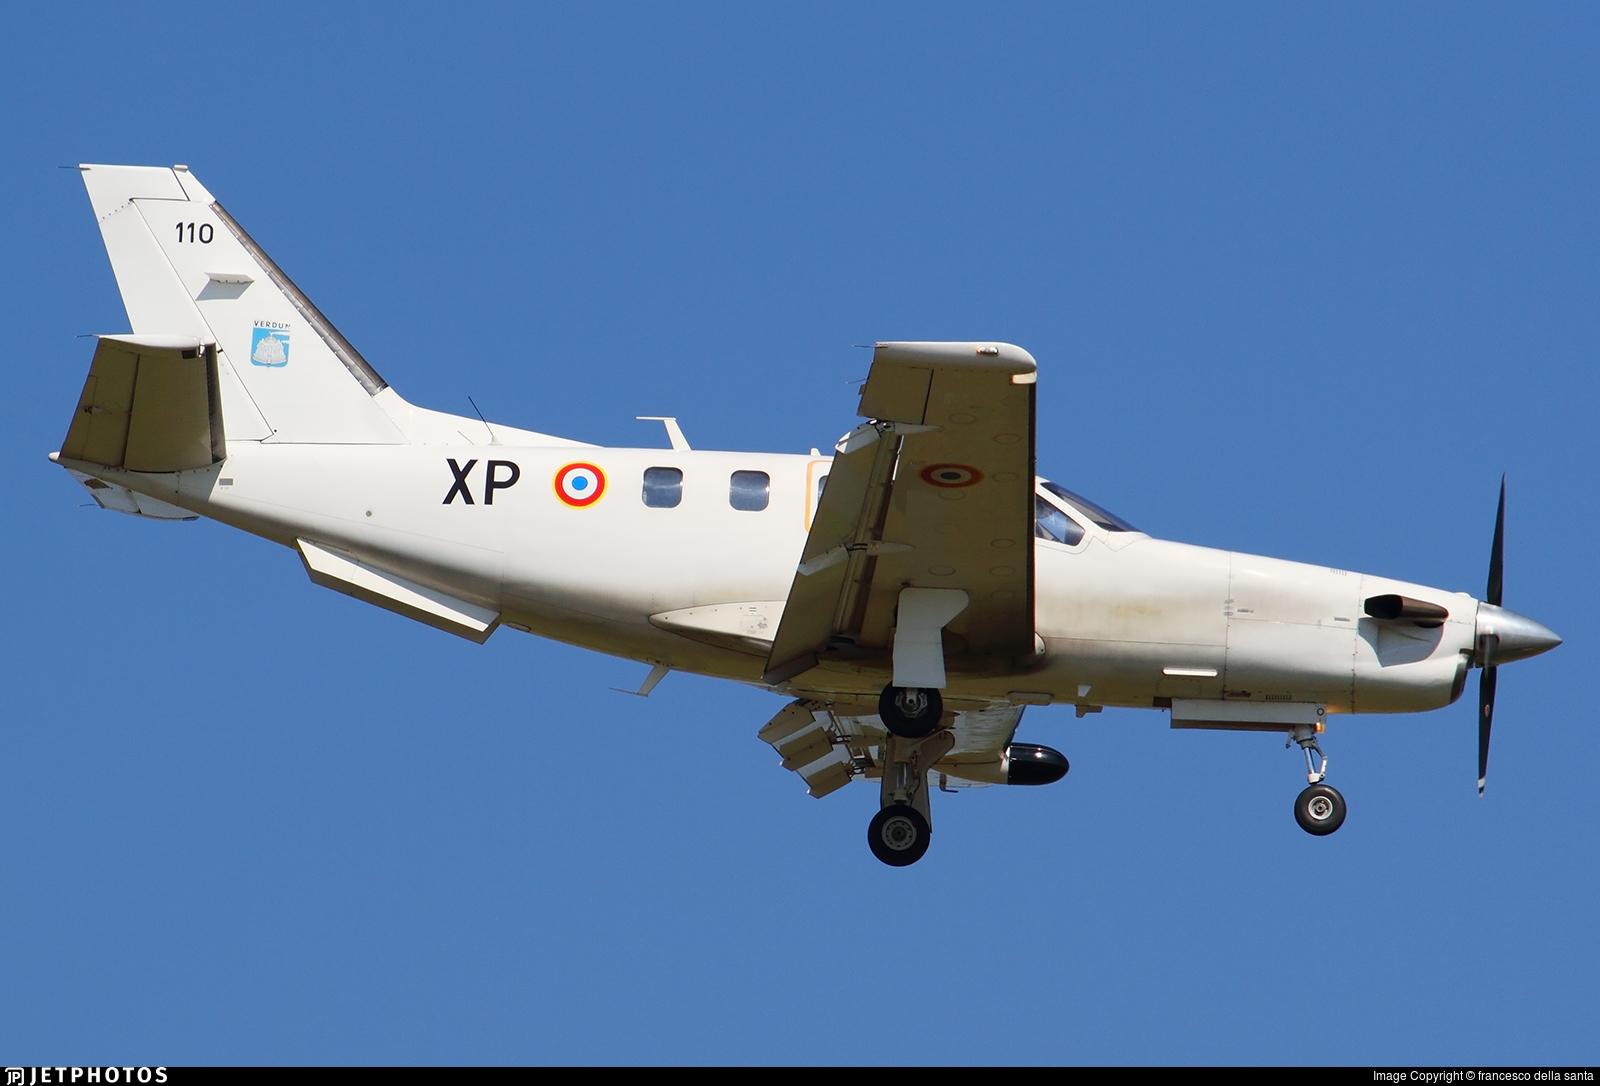 110 - Socata TBM-700 - France - Air Force